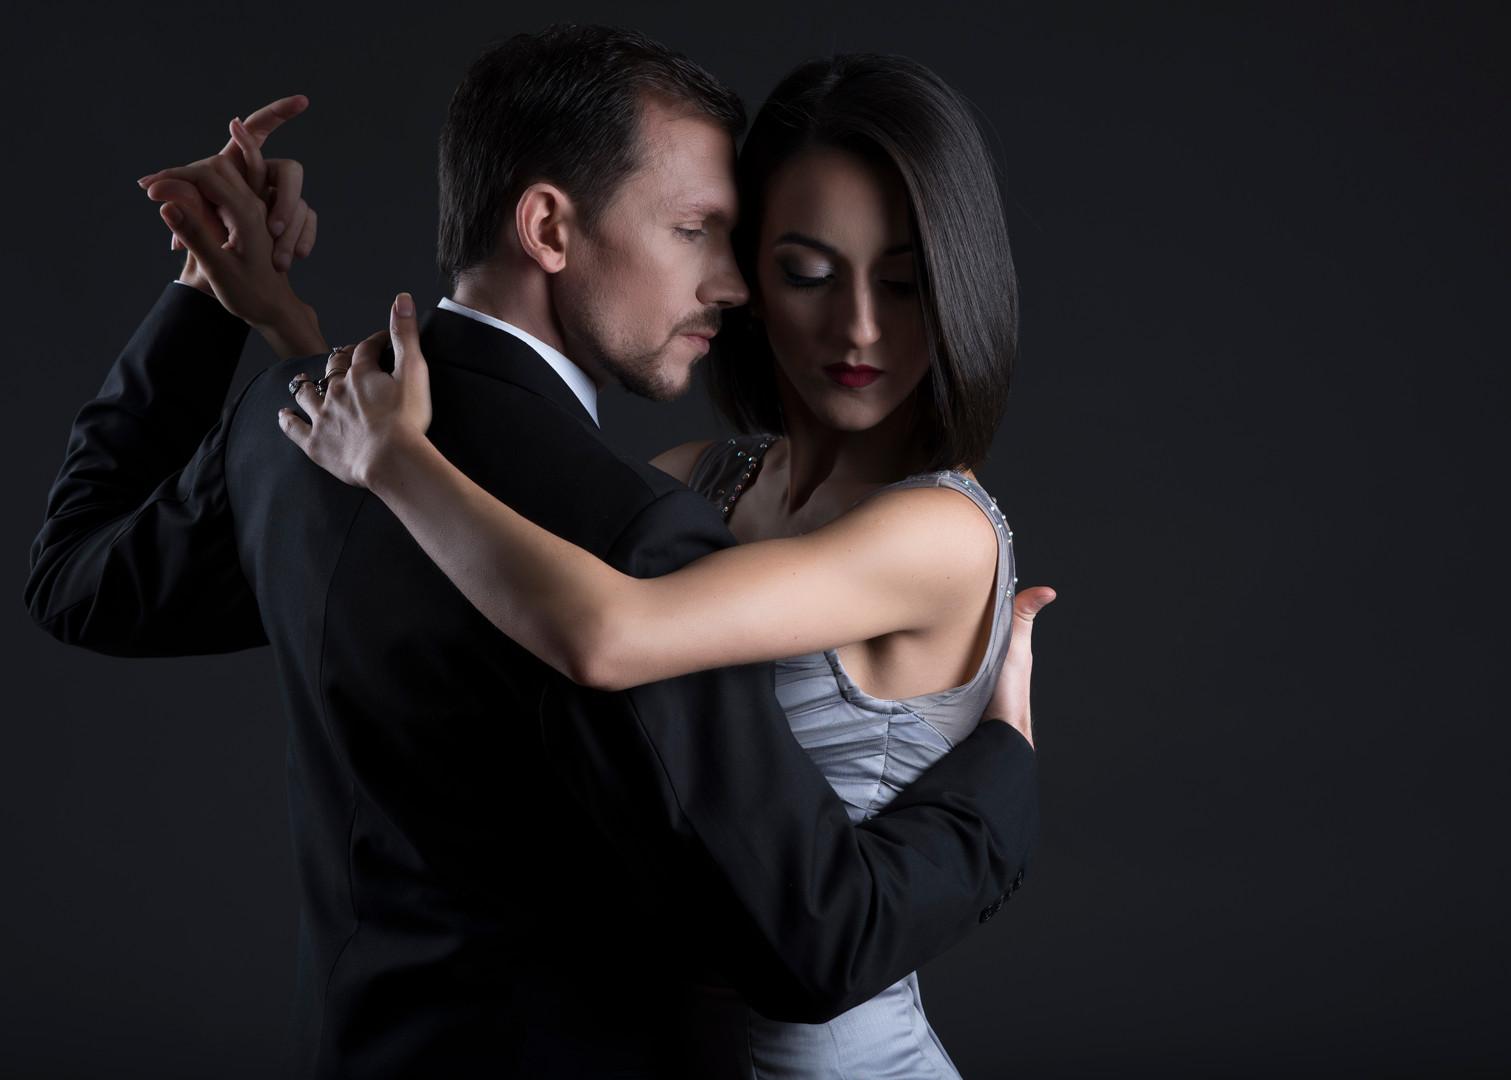 duo danseurs n 4.jpg